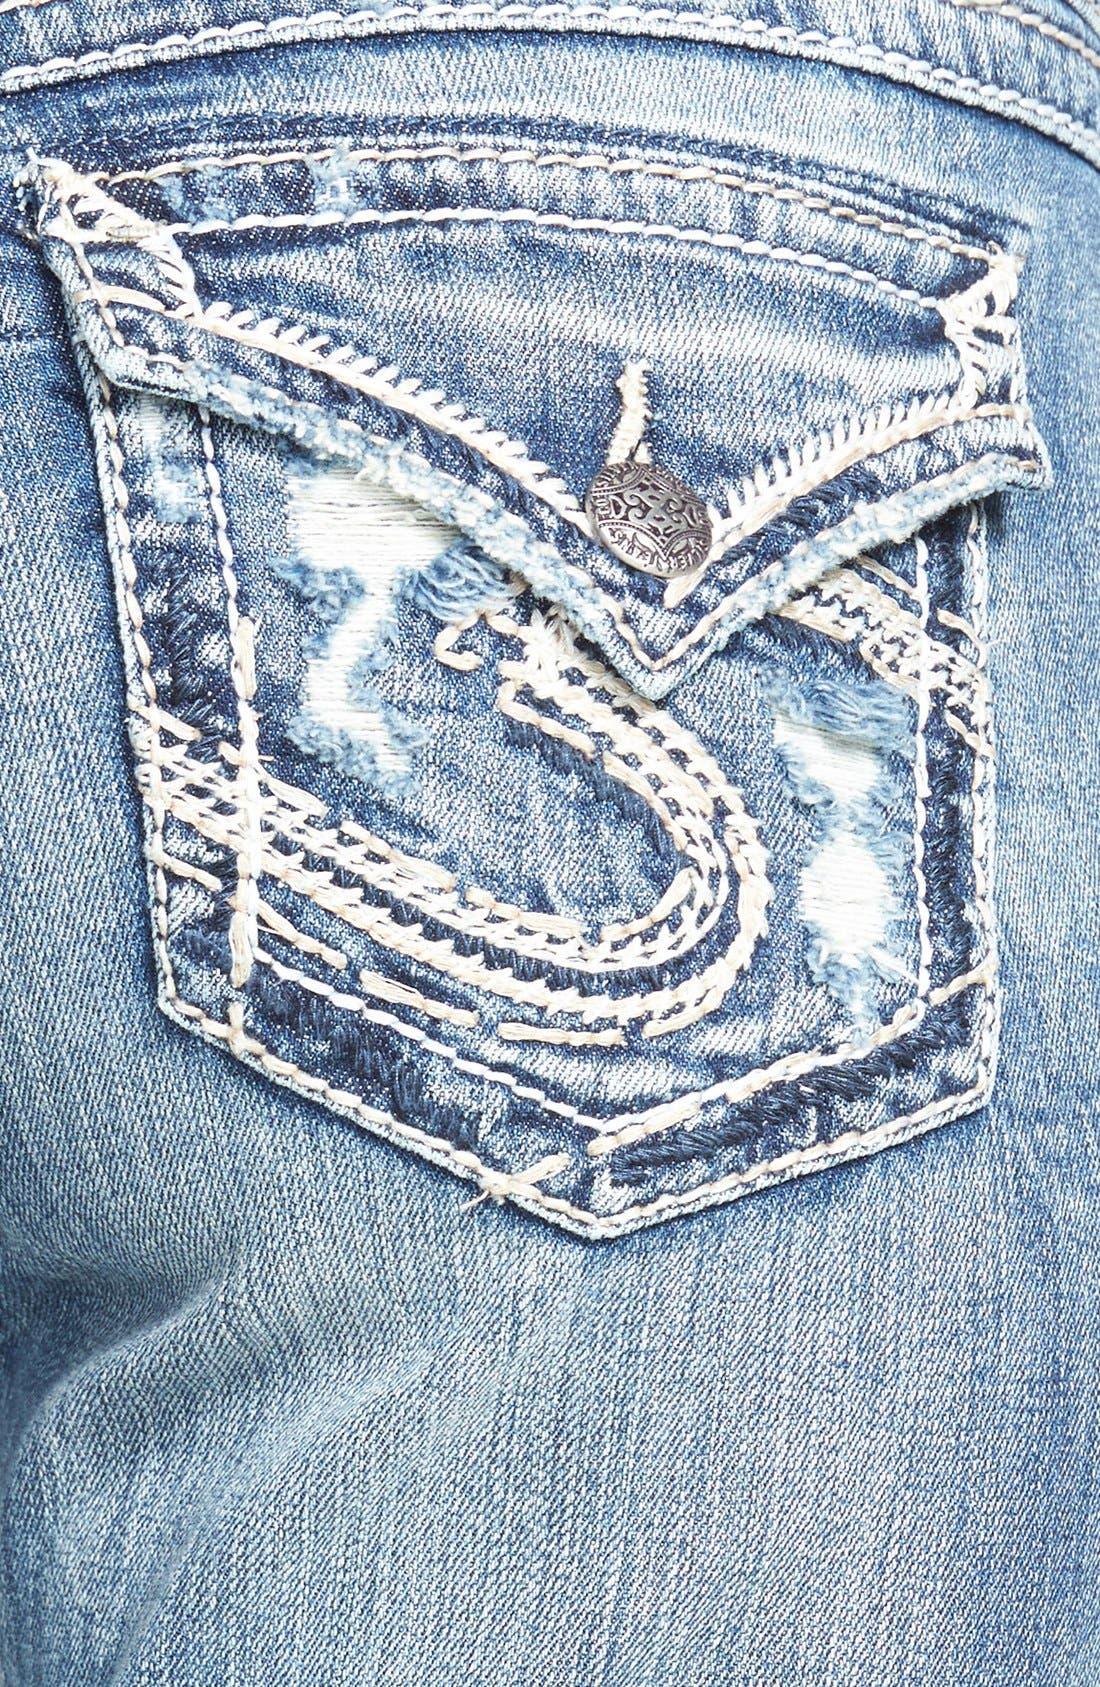 Alternate Image 3  - Silver Jeans Co. 'Suki' Distressed Flap Pocket Slim Bootcut Jeans (Indigo)